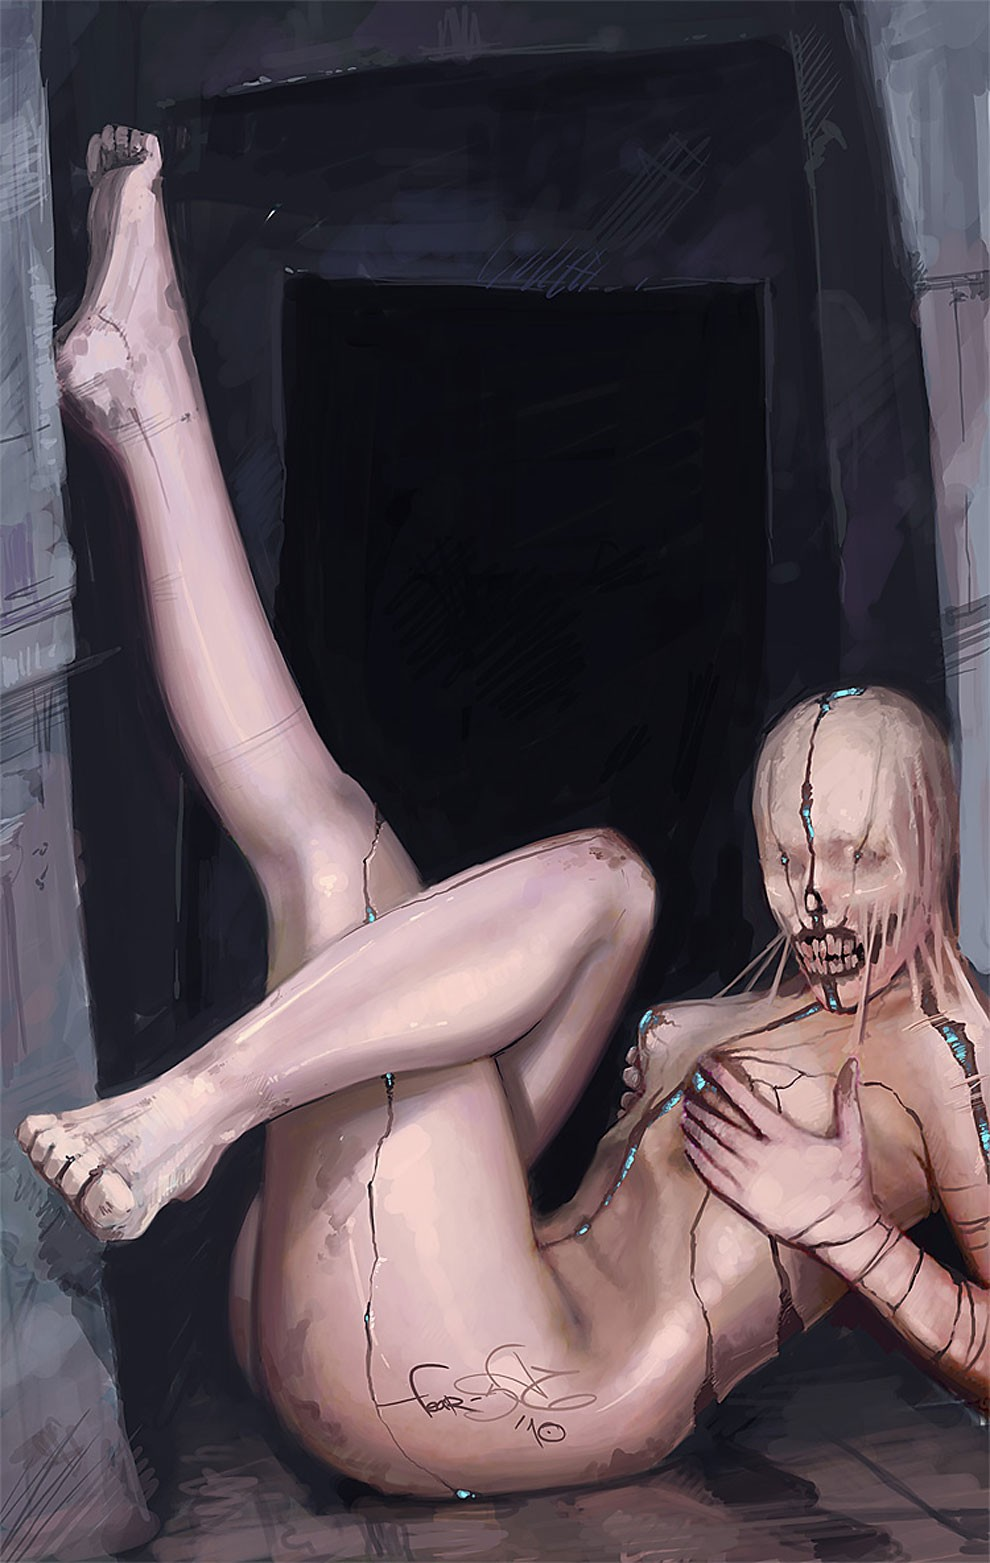 illustrazioni-dipinti-digitali-humor-horror-fantasy-sergey-svistunov-50